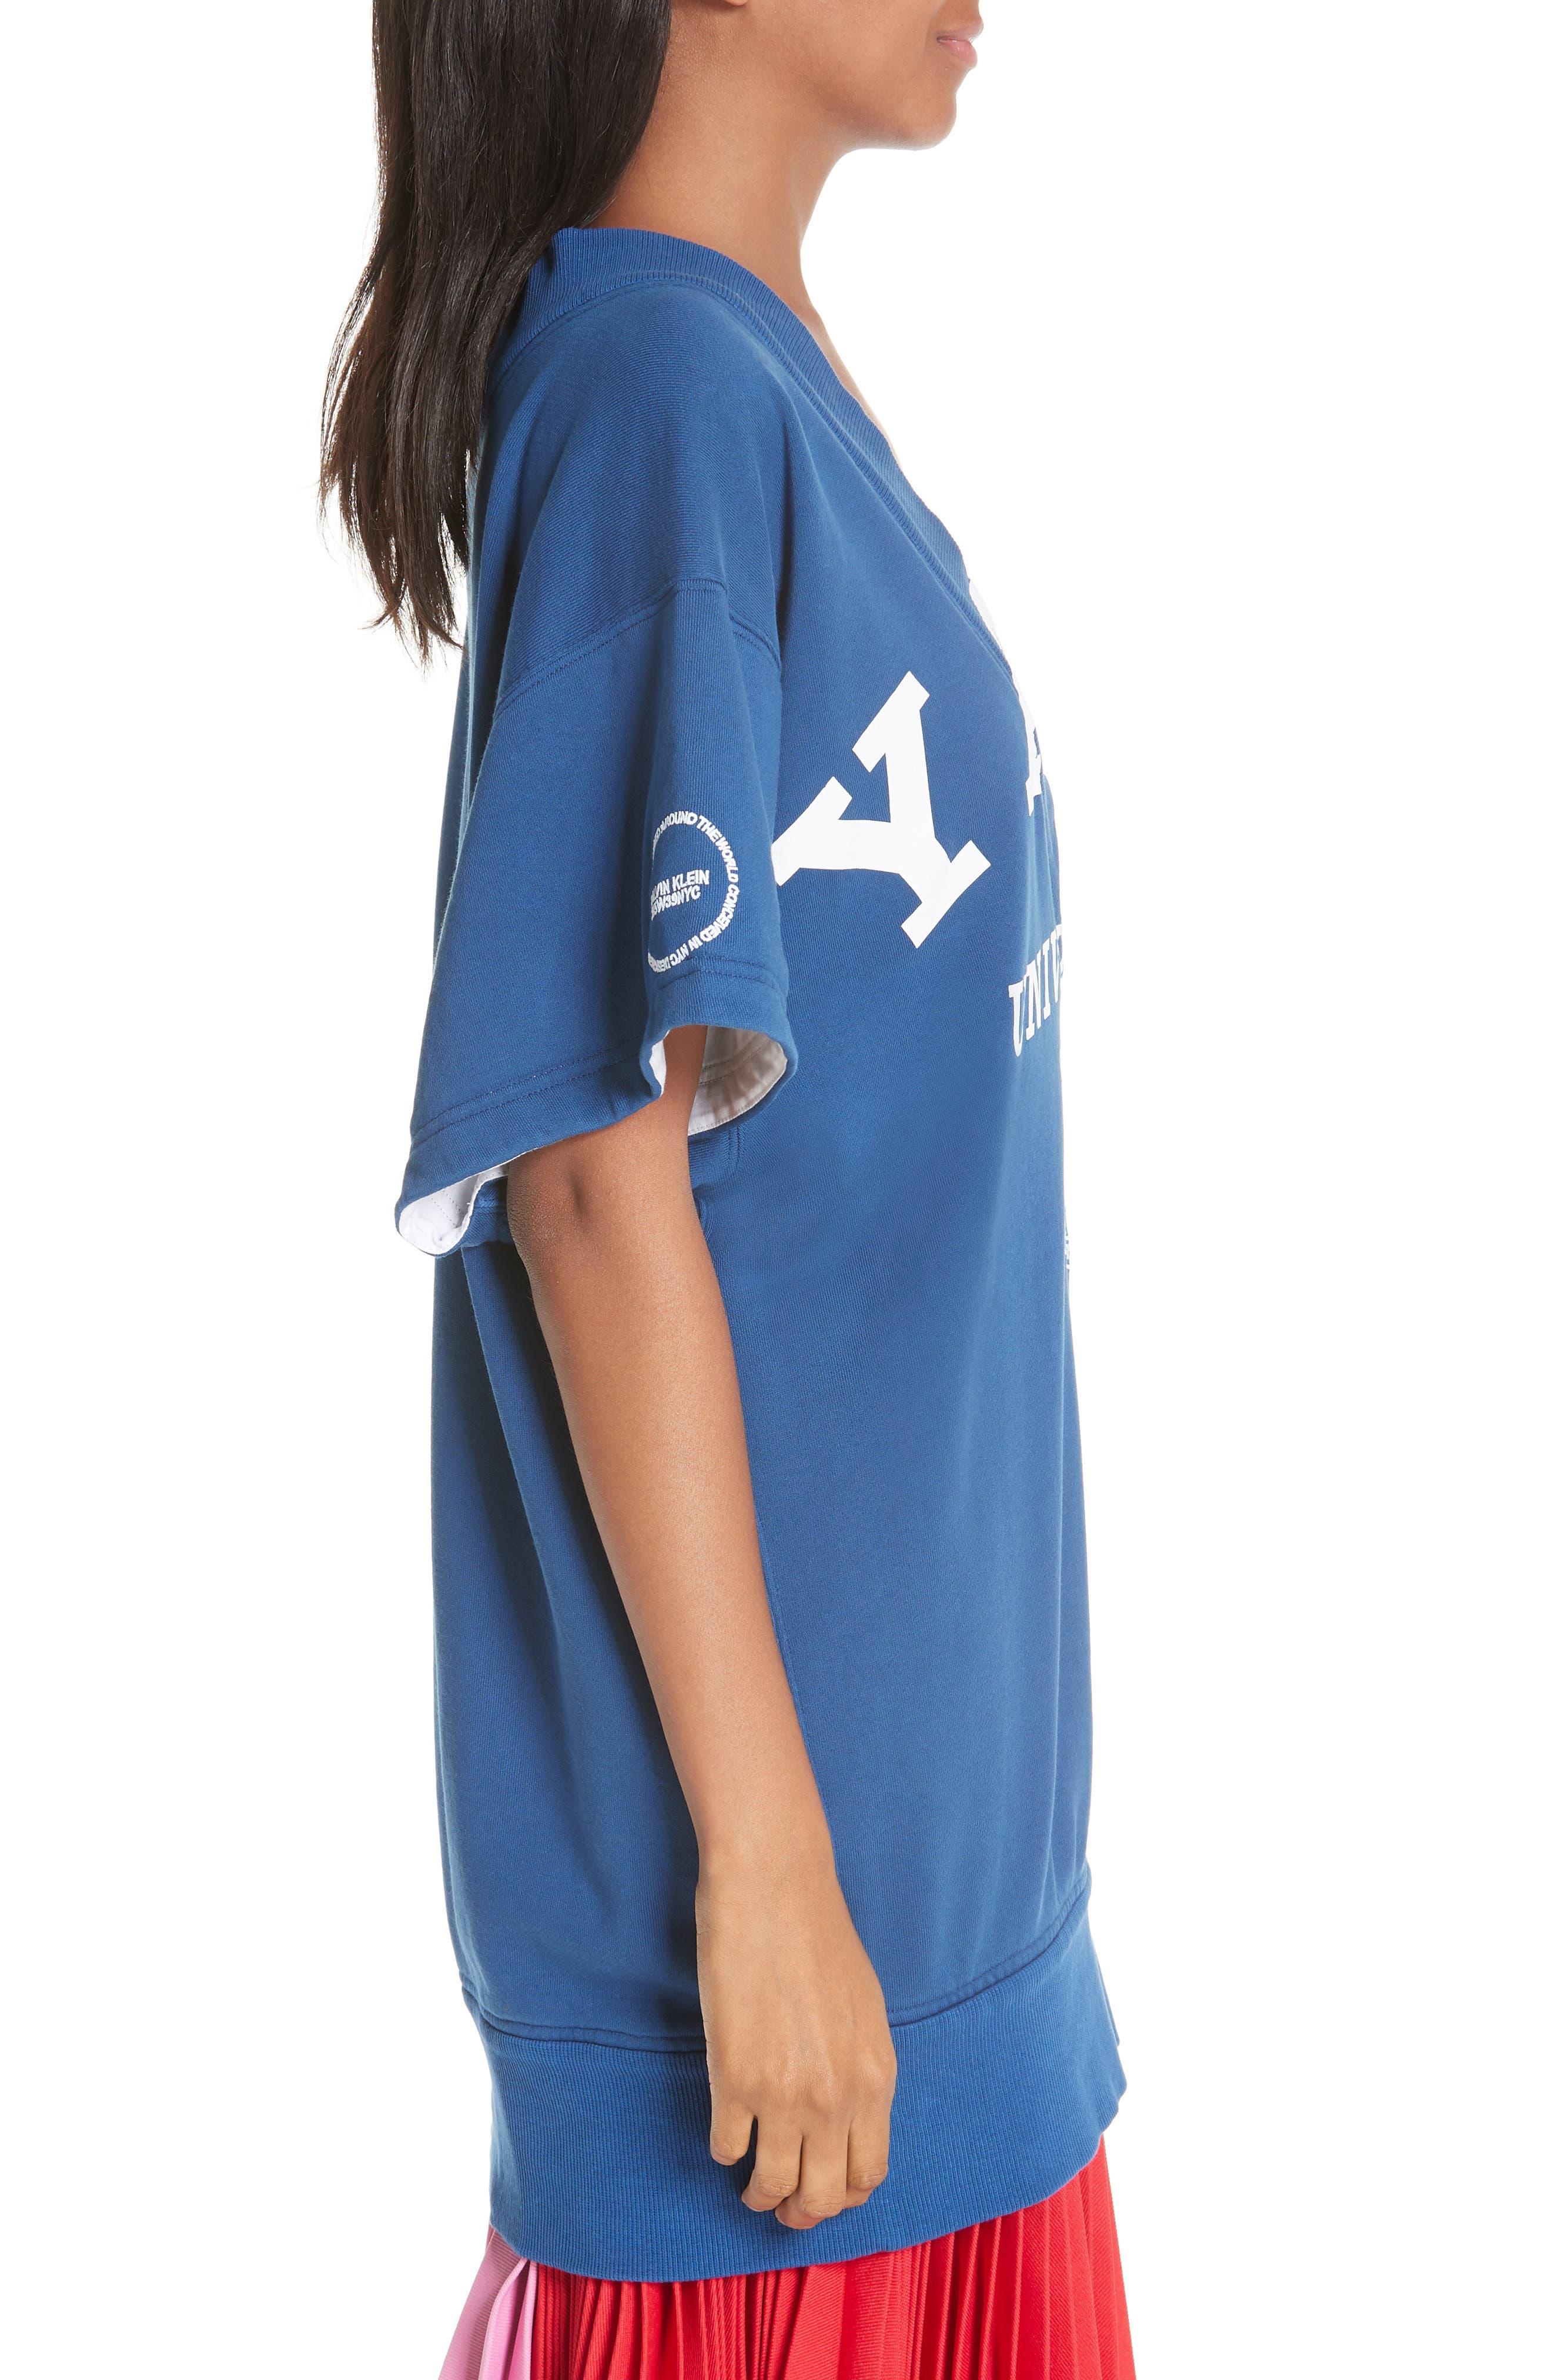 CALVIN KLEIN 205W39NYC, Yale Short Sleeve Sweatshirt, Alternate thumbnail 4, color, YALE BLUE